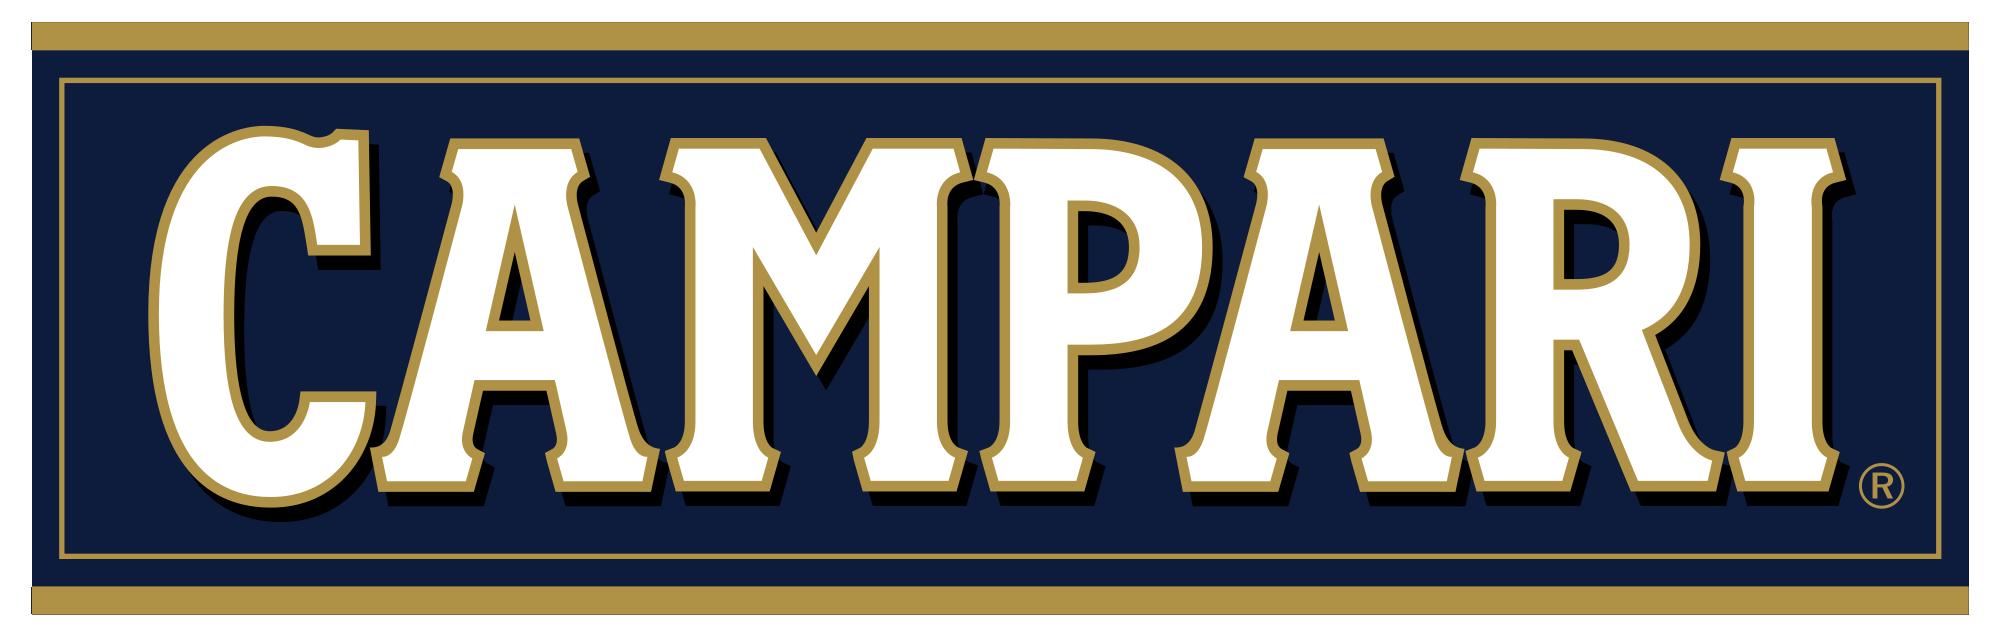 Risultati immagini per campari logo